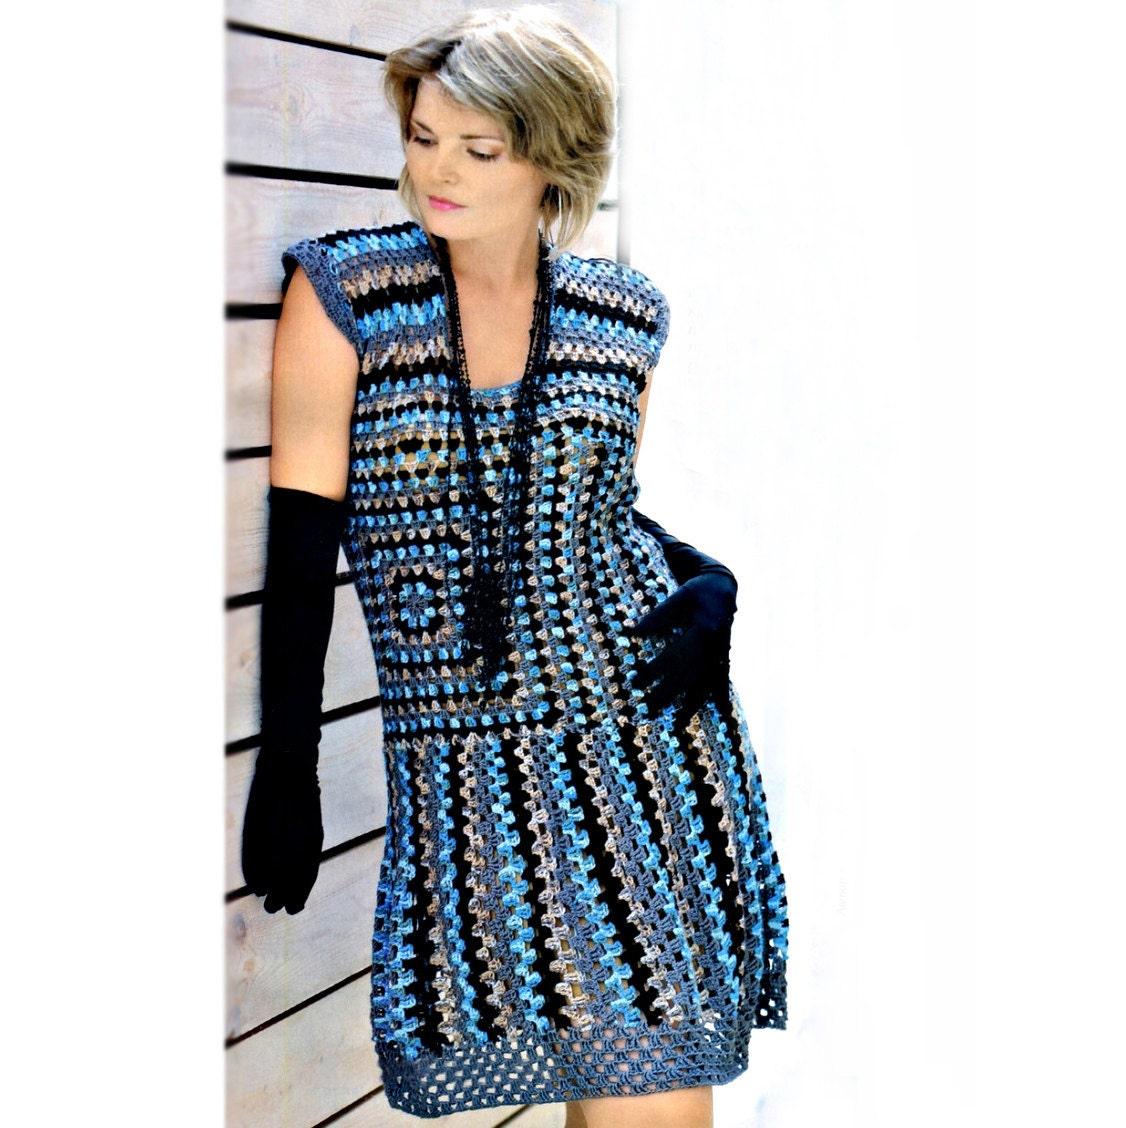 Crochet Granny Square Tunic Pattern : Crochet dress PATTERN, granny squares dress pattern, use ...